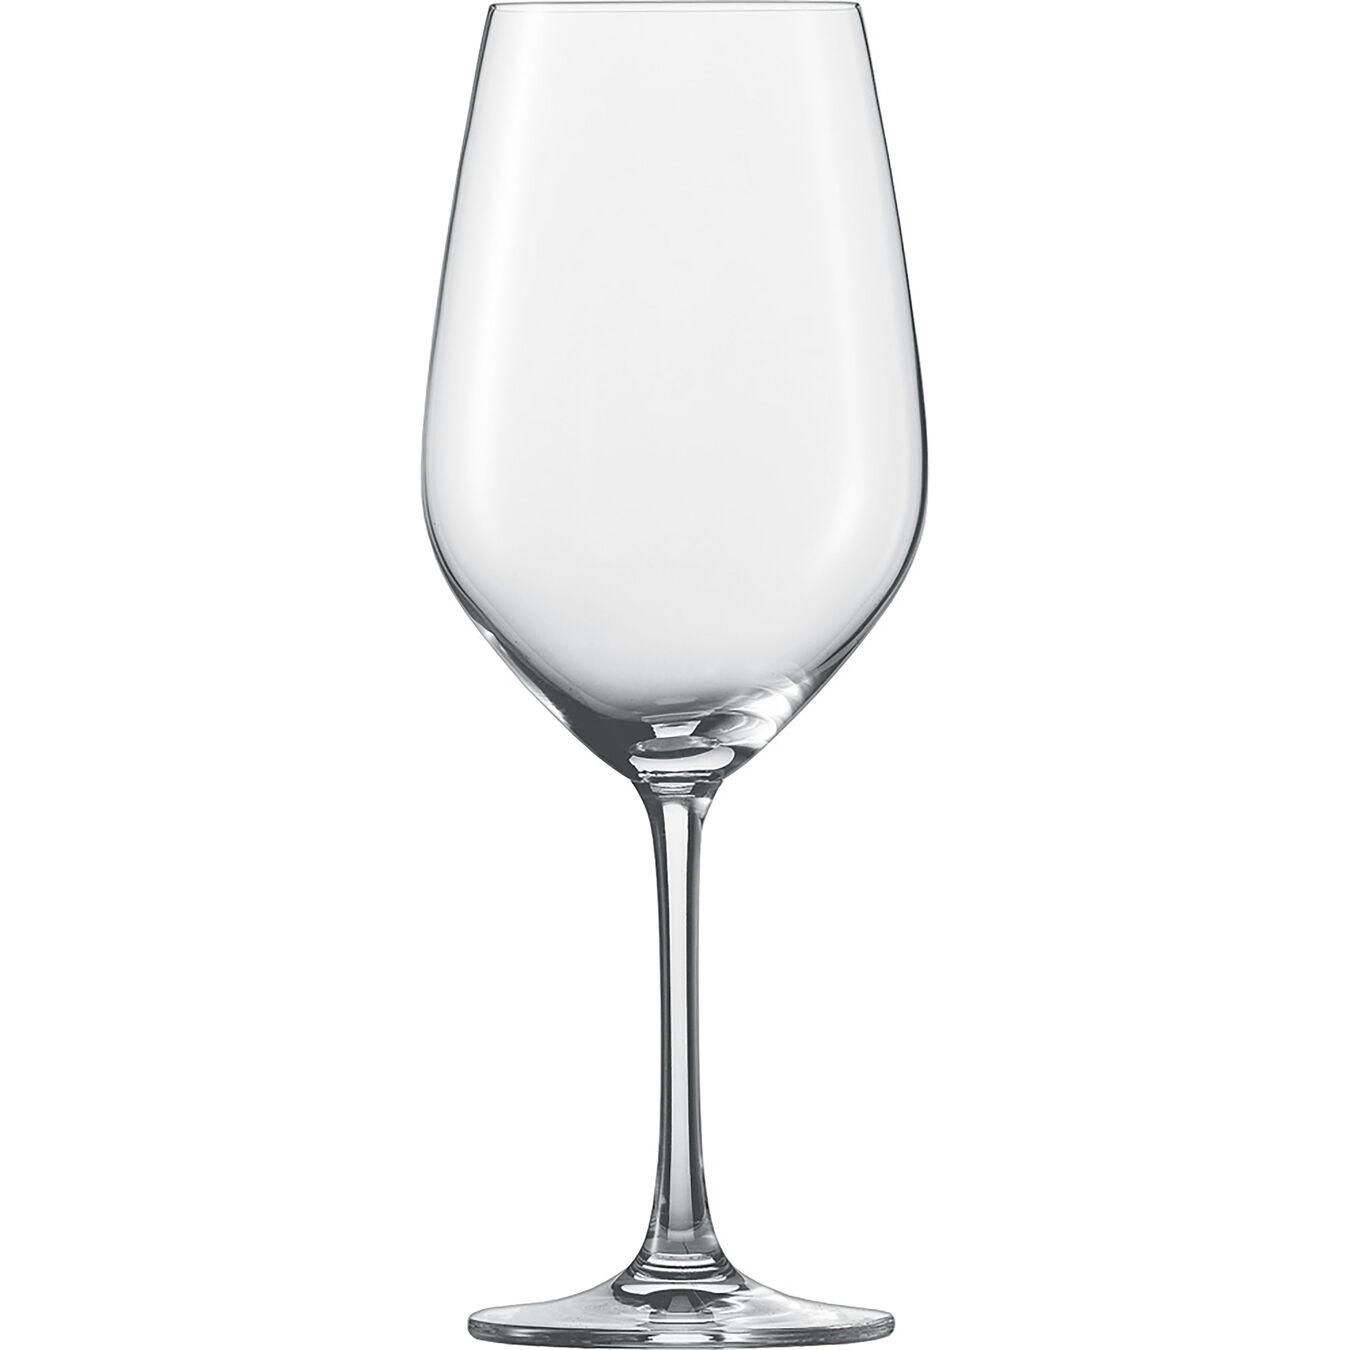 Taça para vinho tinto 530 ml,,large 1